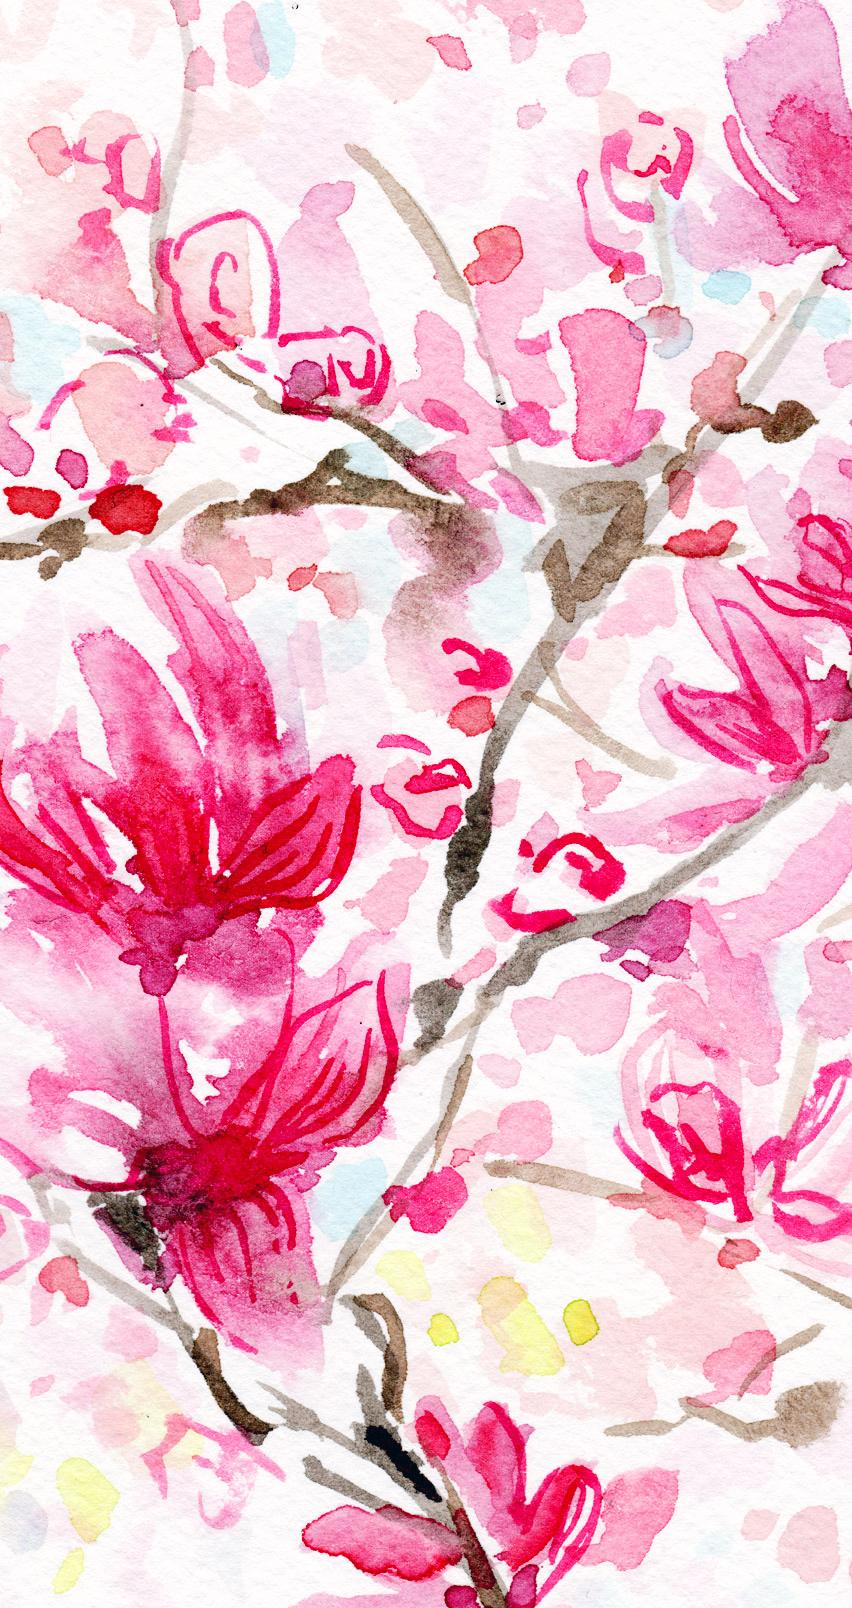 Watercolor Wallpaper Flowers Iphone , HD Wallpaper & Backgrounds